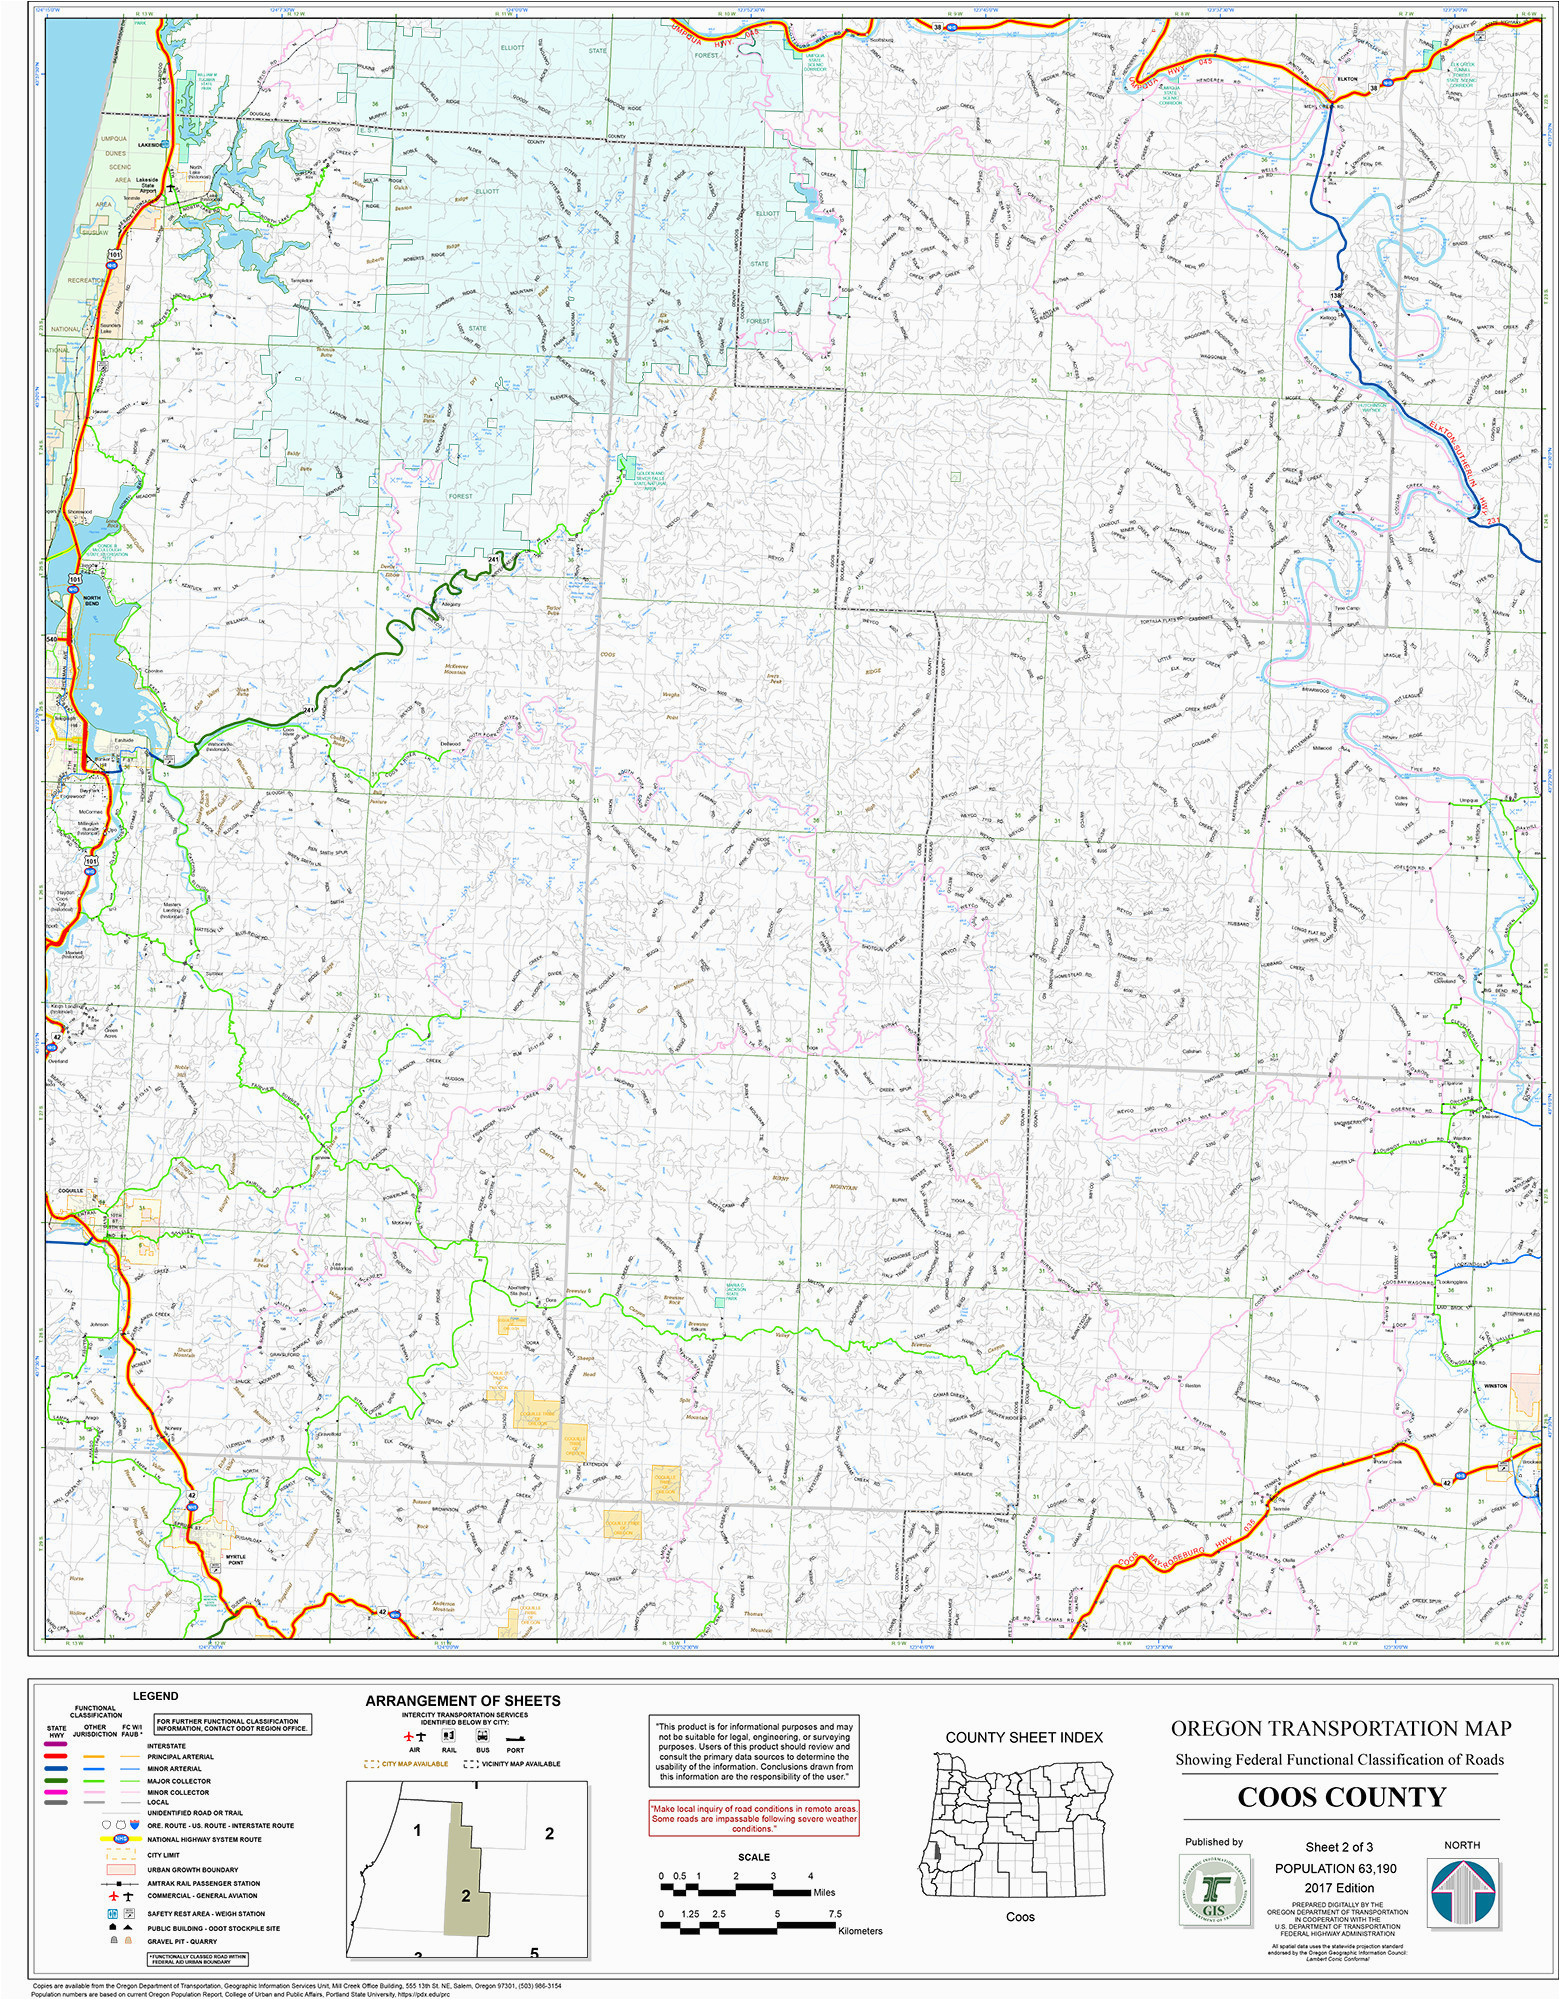 Free Map Of Georgia.Georgia Road Construction Map Georgia Lakes Map Luxury Georgia Zip